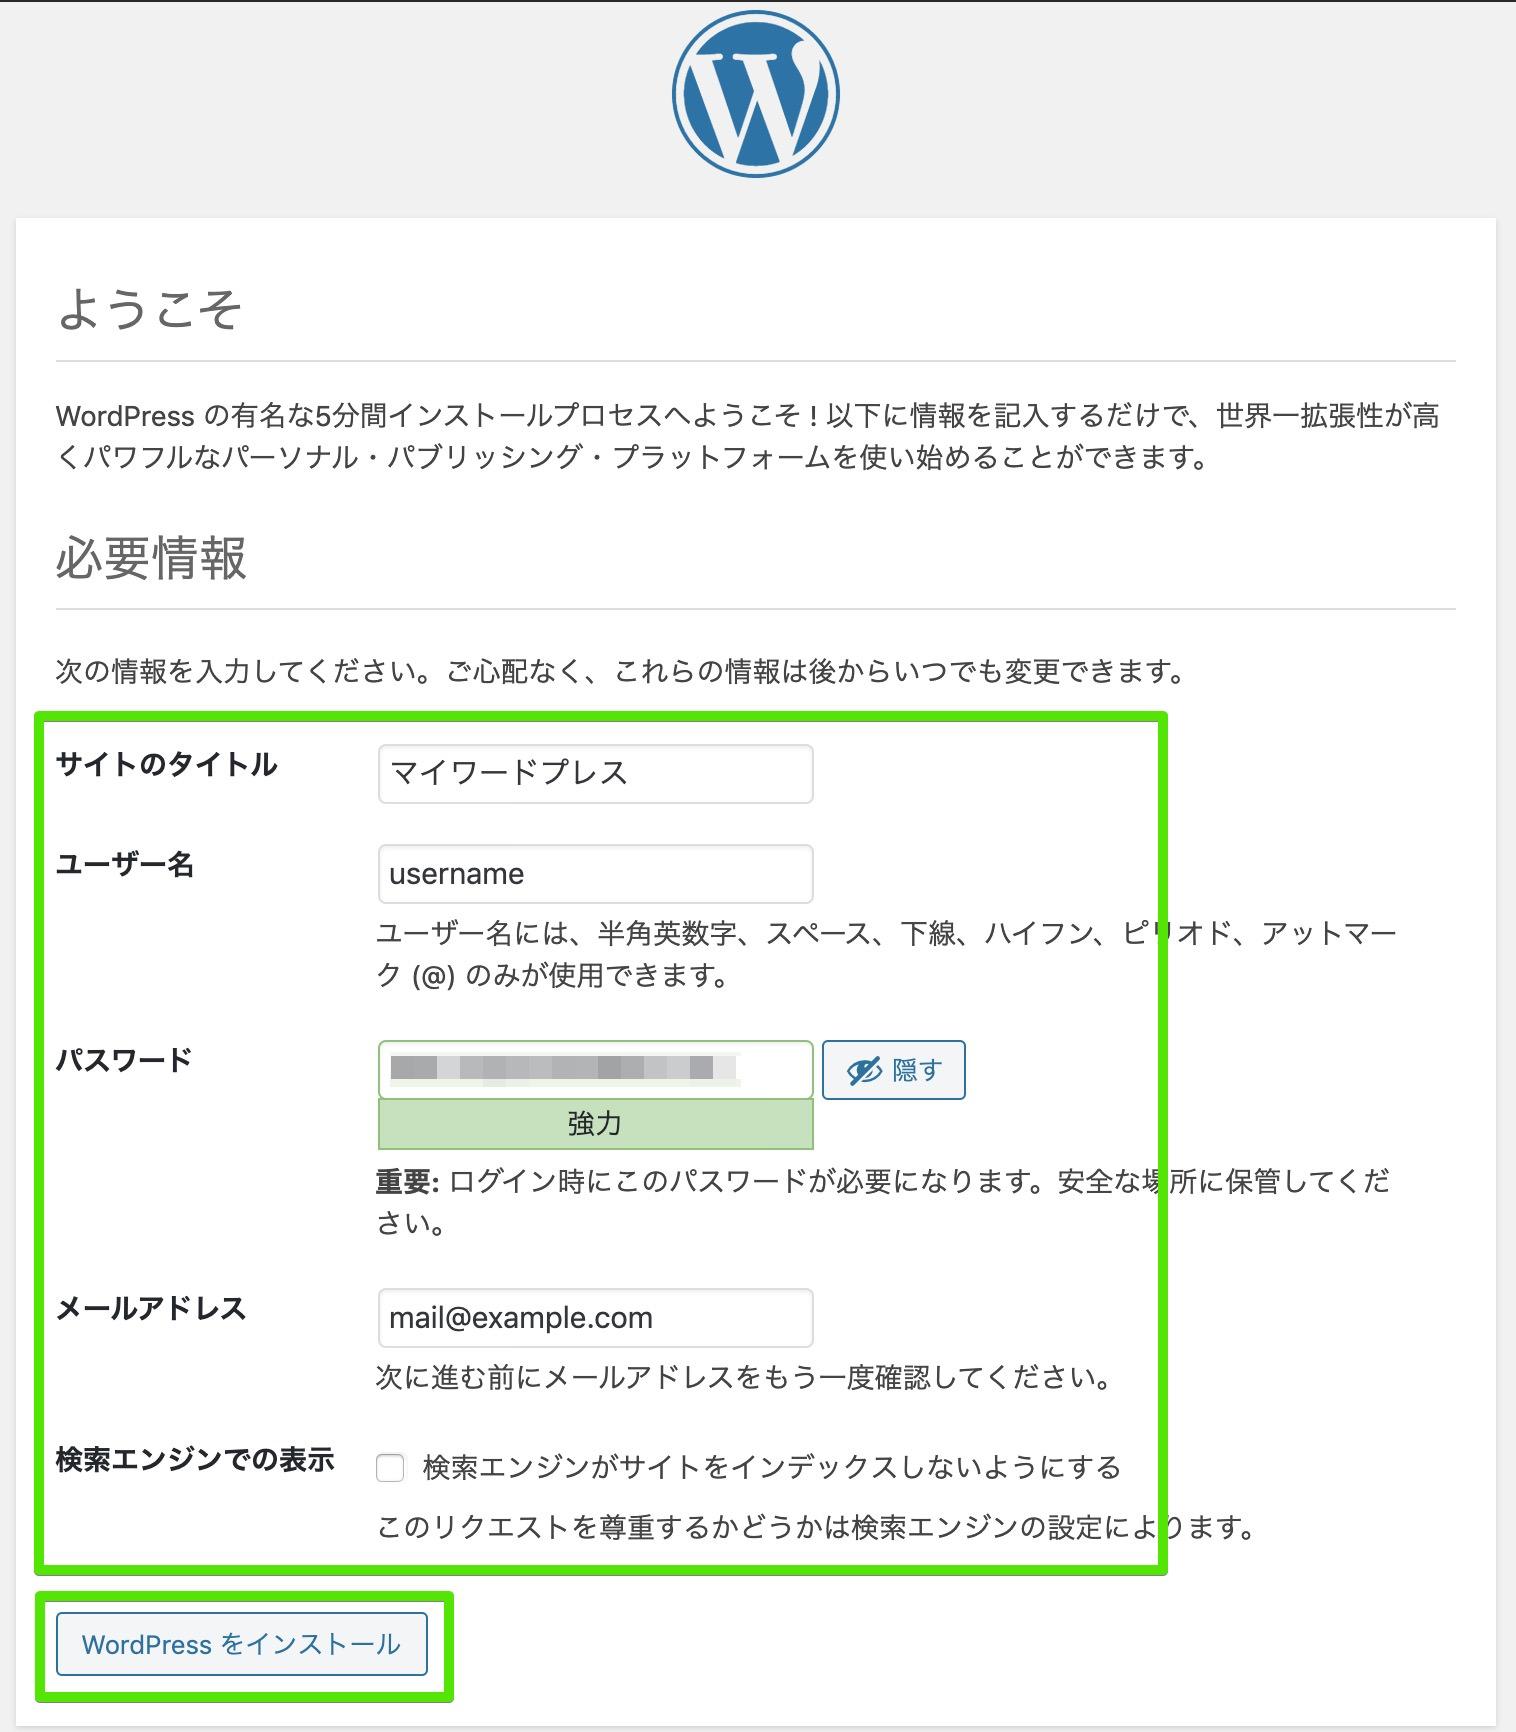 WordPressサイト情報の入力